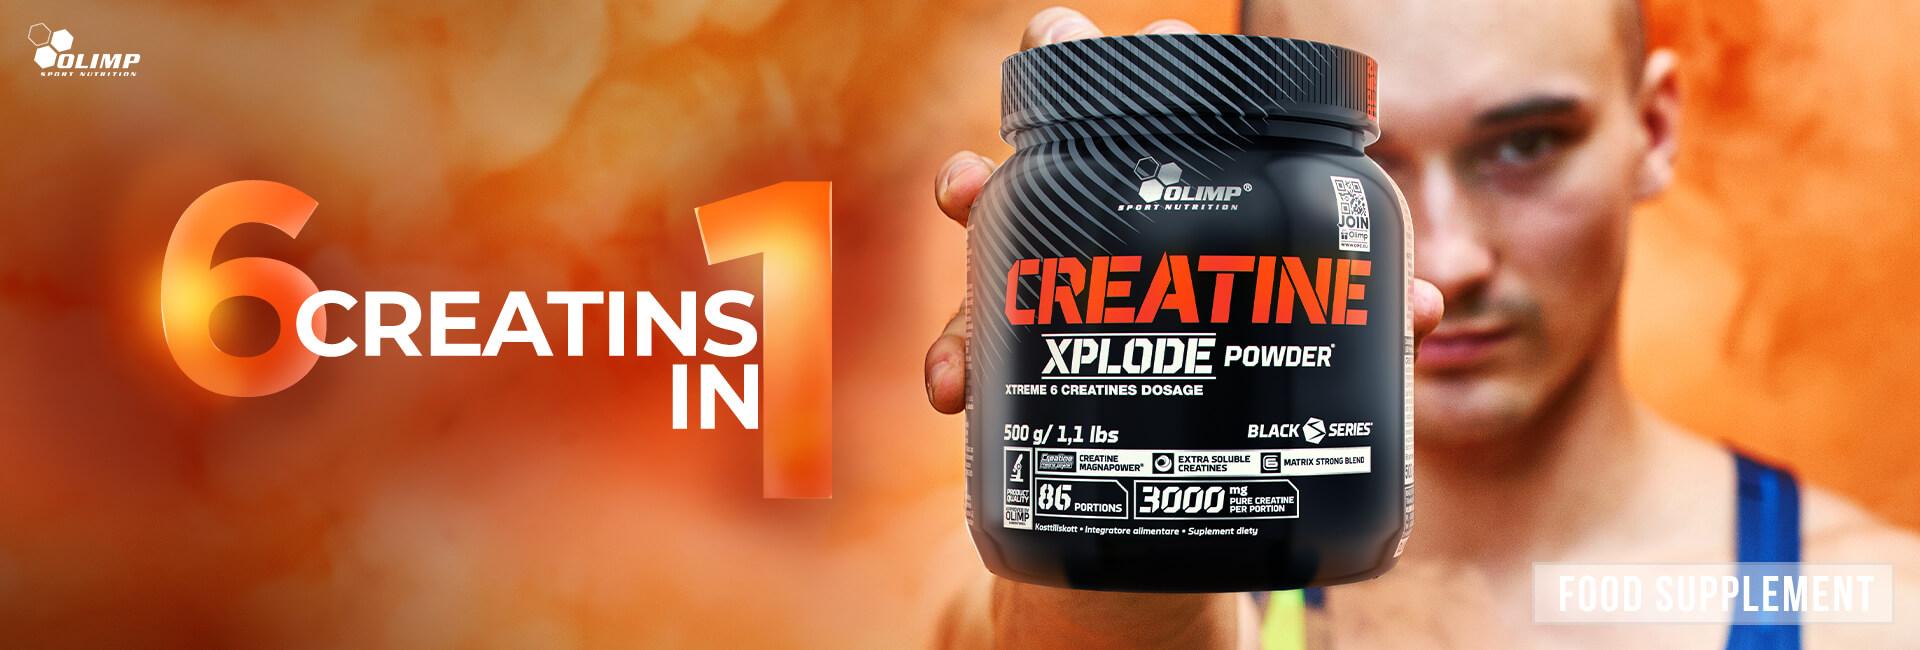 Creatine Xplode Powder